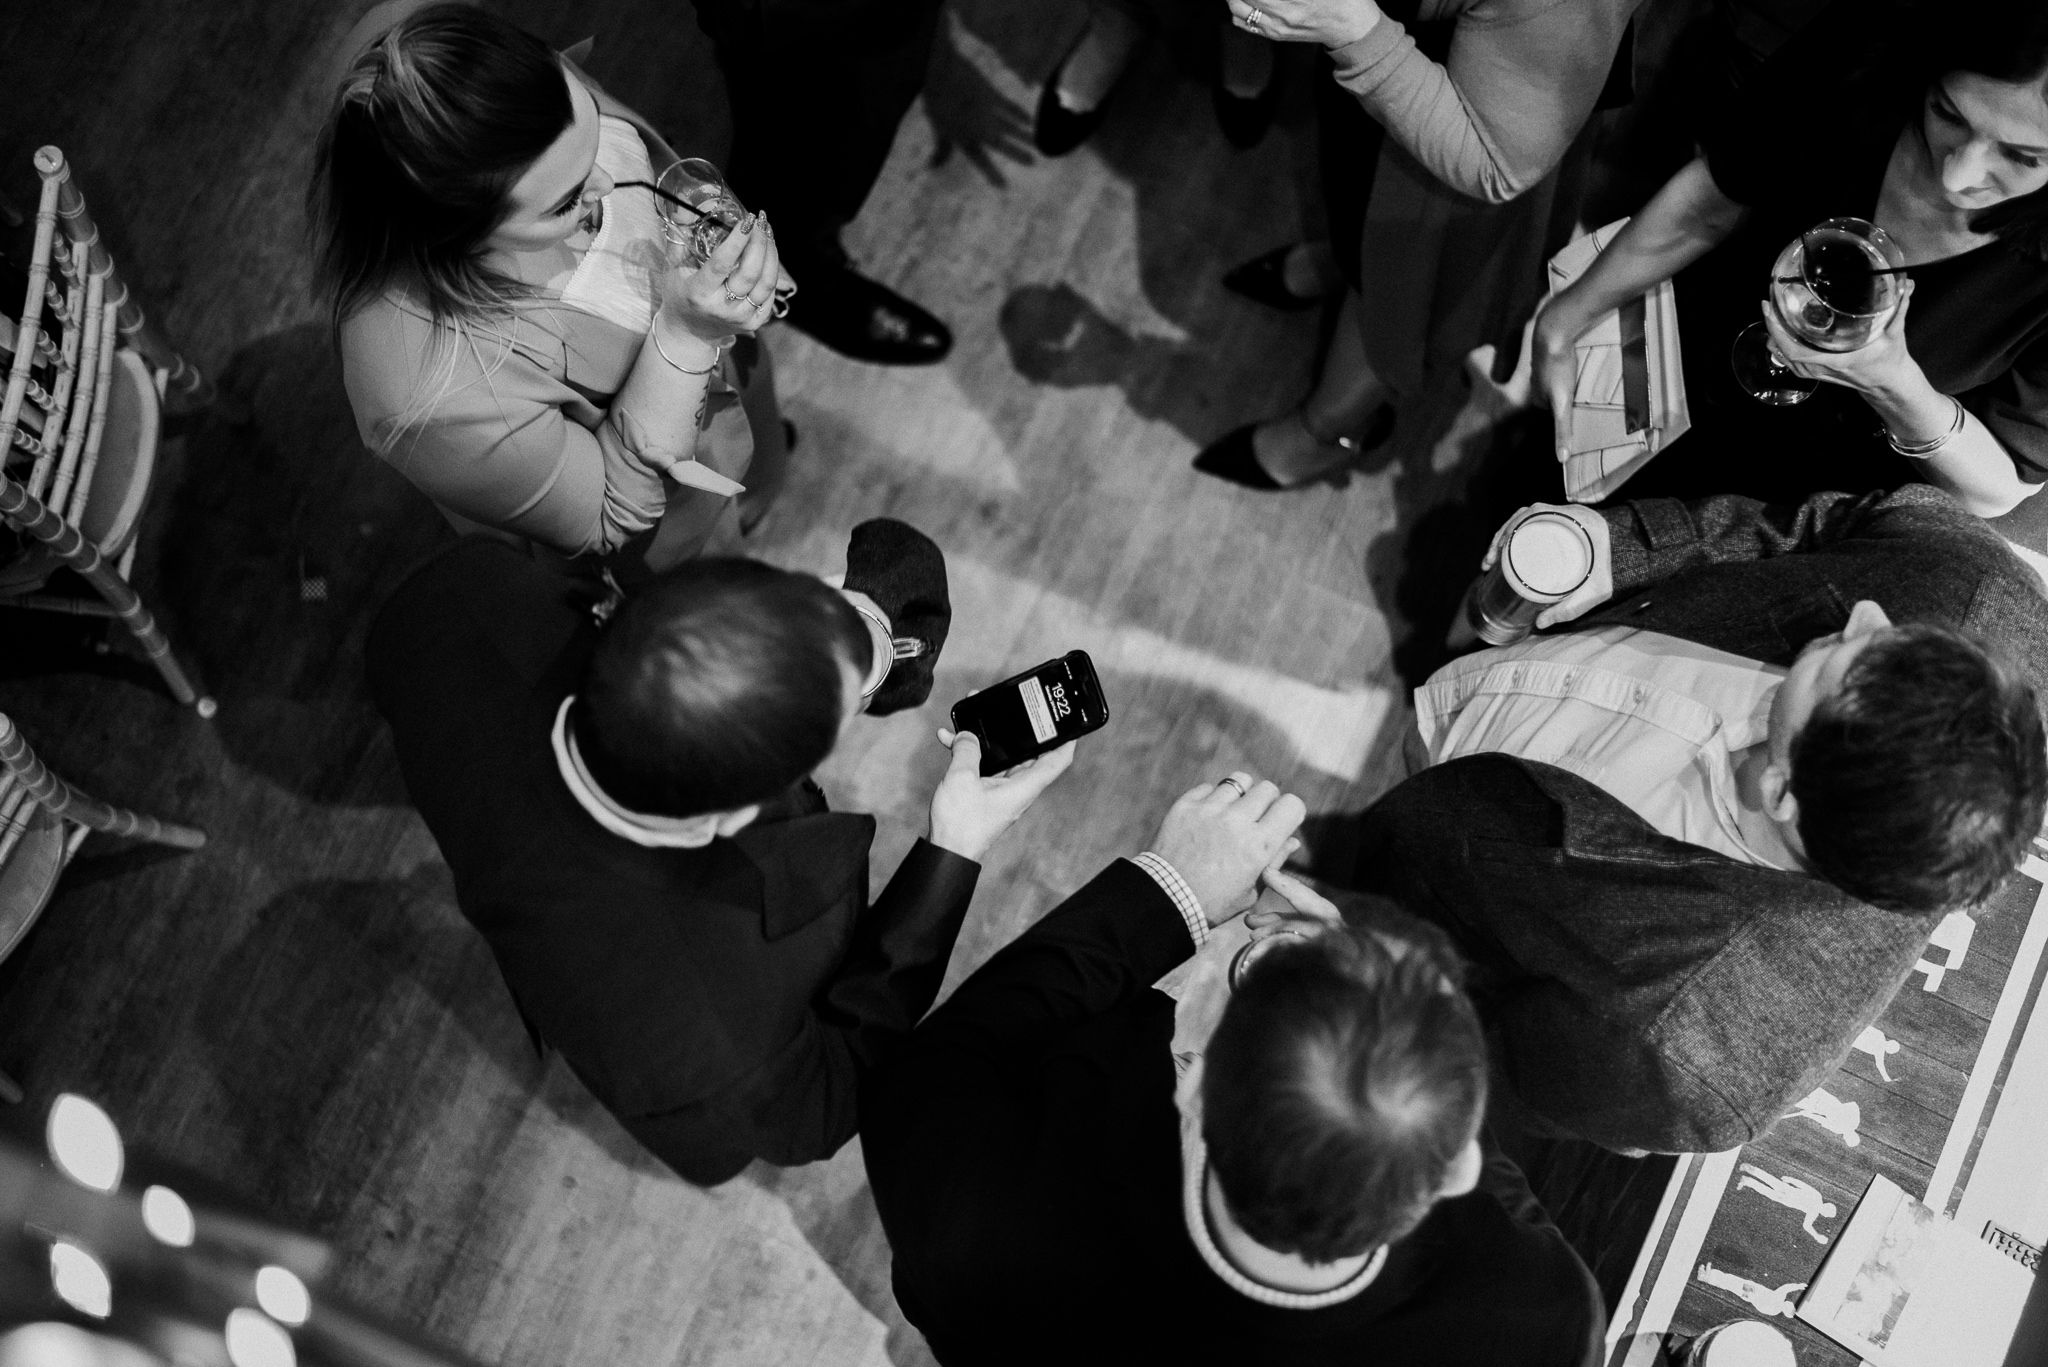 creative-west-yorkshire-wedding-photographer-8.jpg